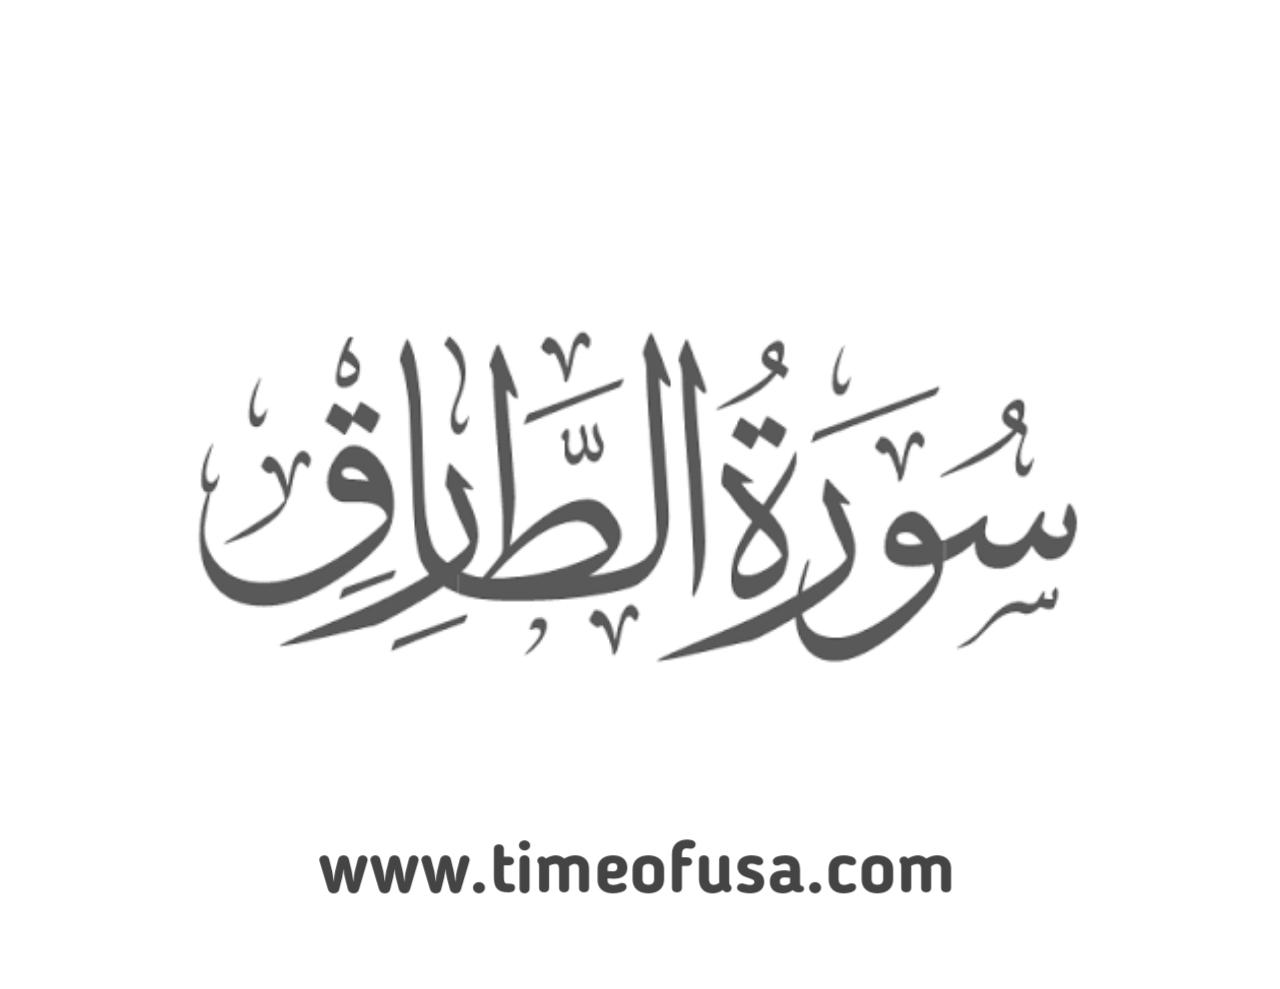 surah tariq, surat at tariq, surah al tariq, surah tariq pdf, surah 86, surah e tariq, surah al thariq, surah tariq translation, surah tariq with urdu translation, arti surat at tariq, quran surat at thariq, surah tariq english, surah wassama i wa tariq, surah at tariq ayat 4, surah tariq in english, surah tariq tafseer, surah tariq meaning, wassama i wa tariq, surah tariq full, surah tariq in hindi, al tariq surah, surah al tariq in english, surath thariq, surah at torik